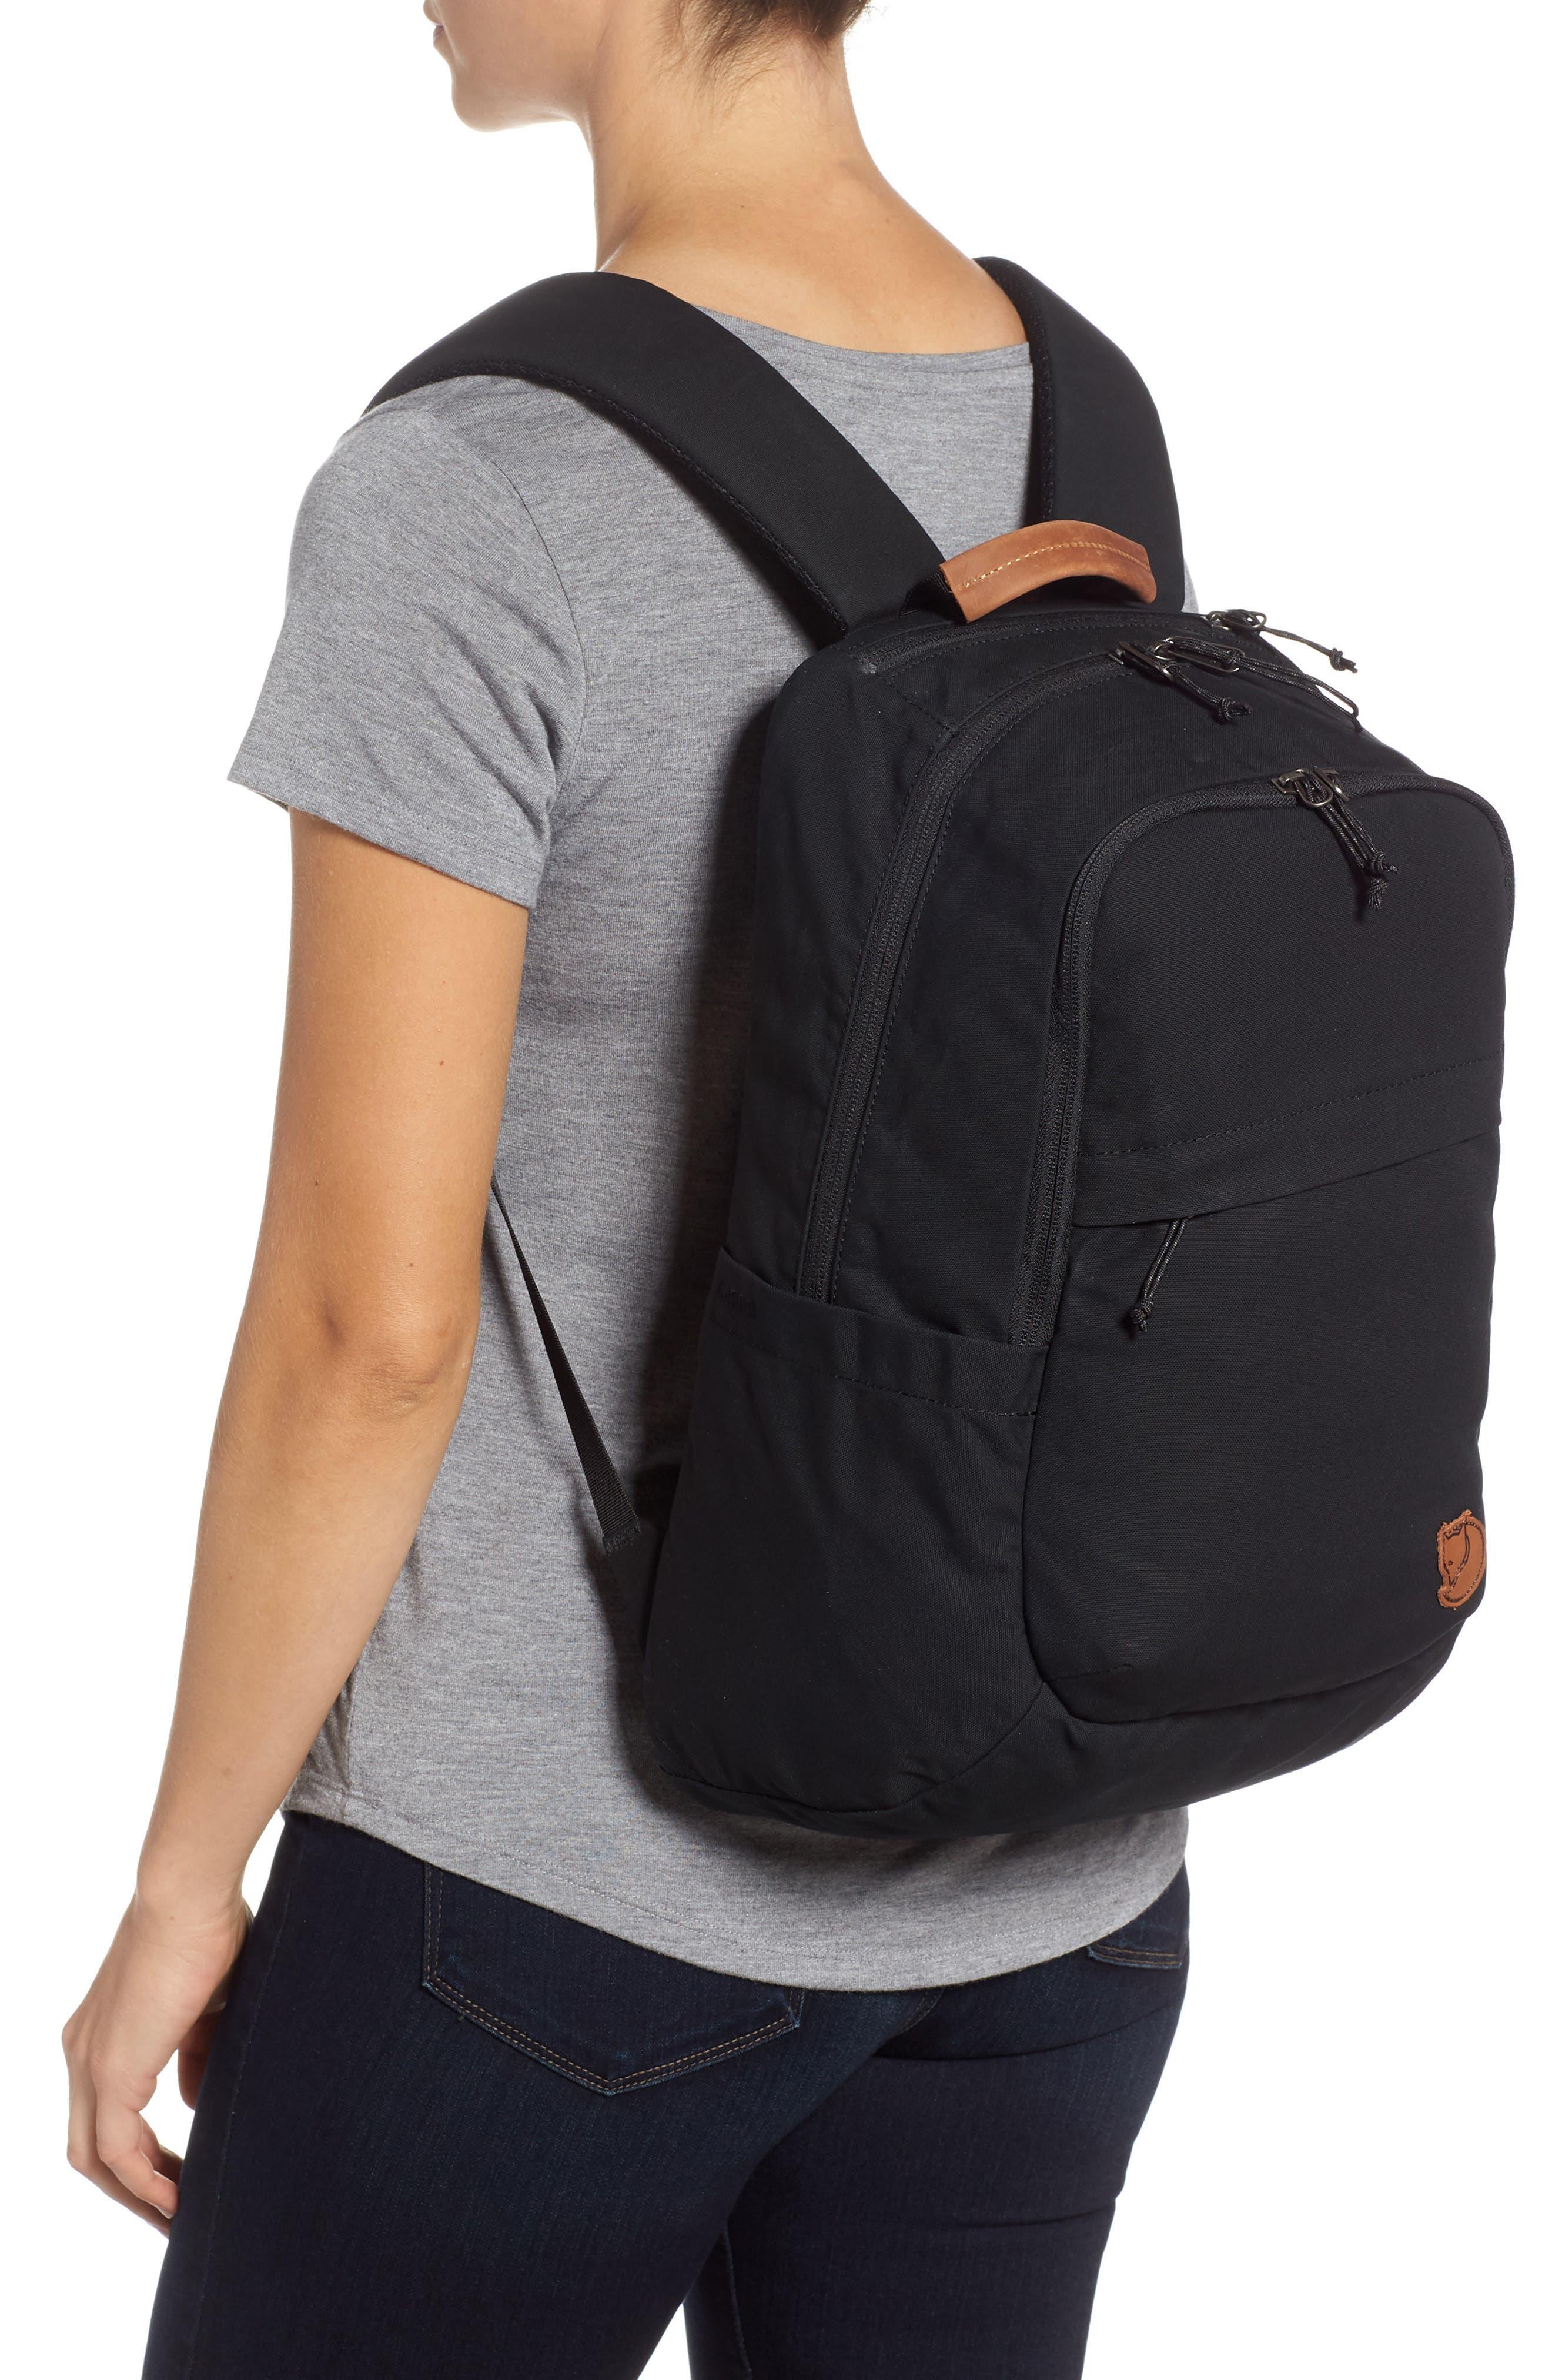 Räven 20L Backpack,                             Alternate thumbnail 2, color,                             BLACK